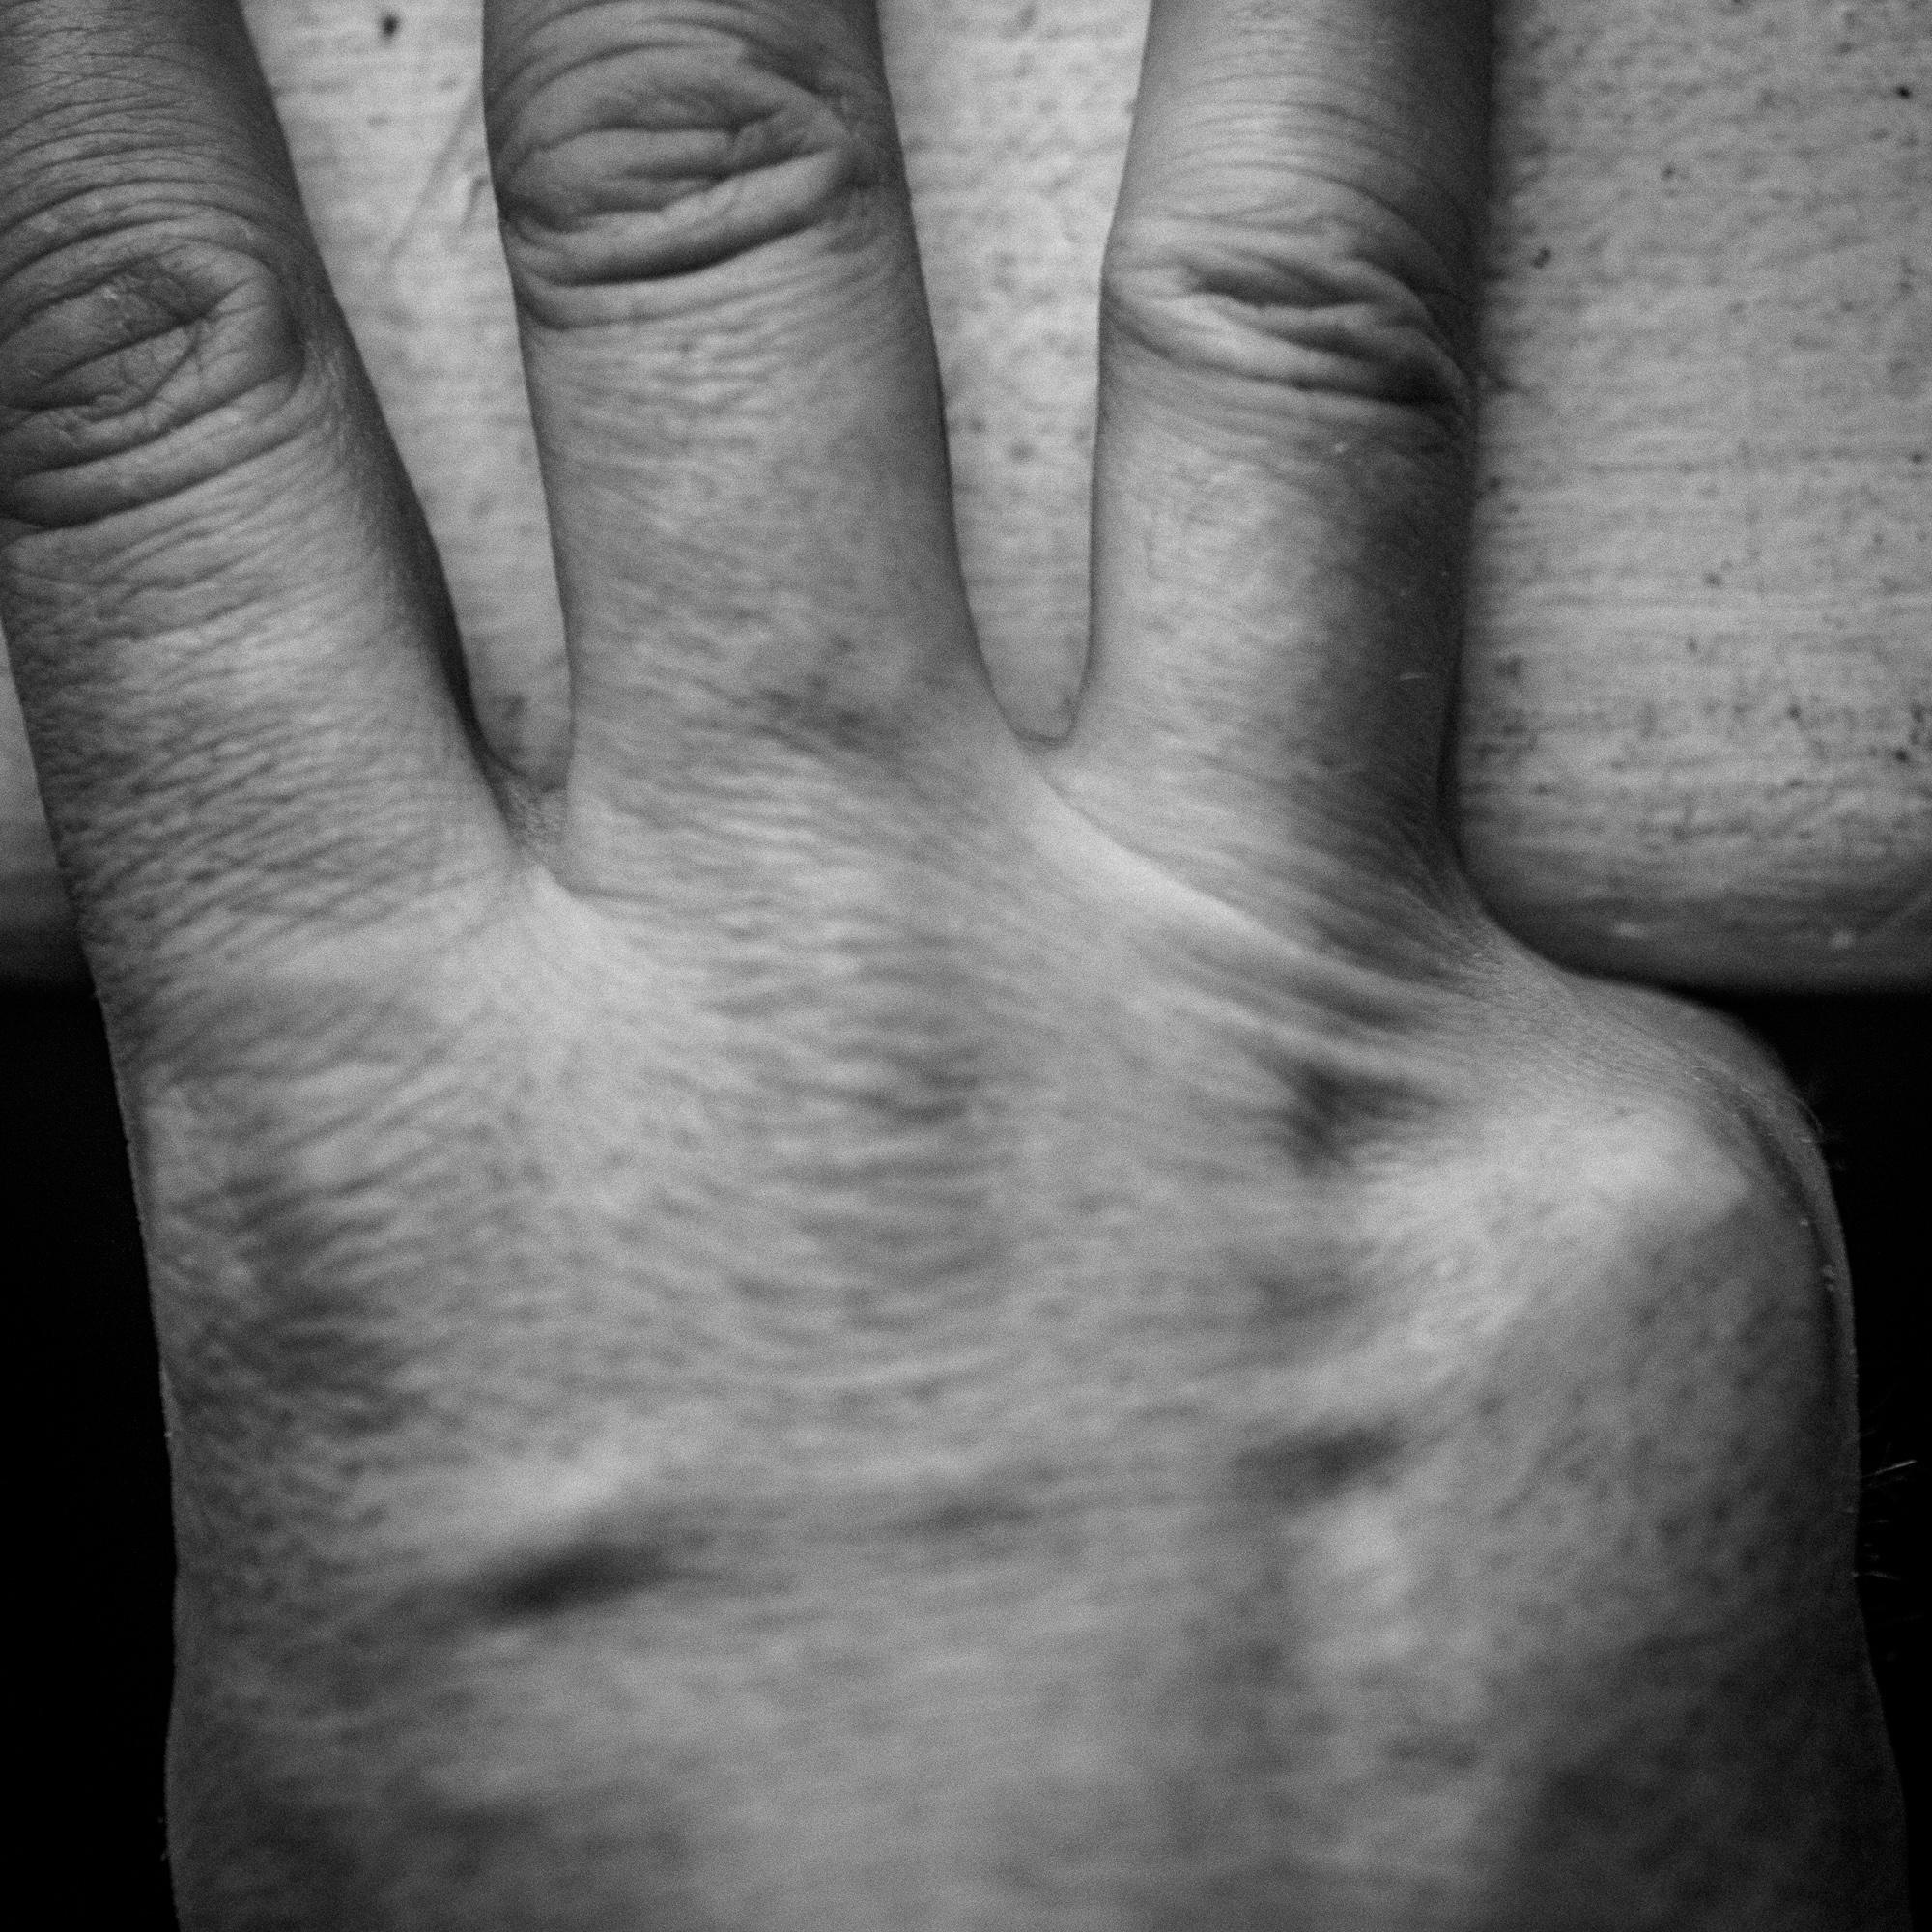 Hand13-104.jpg